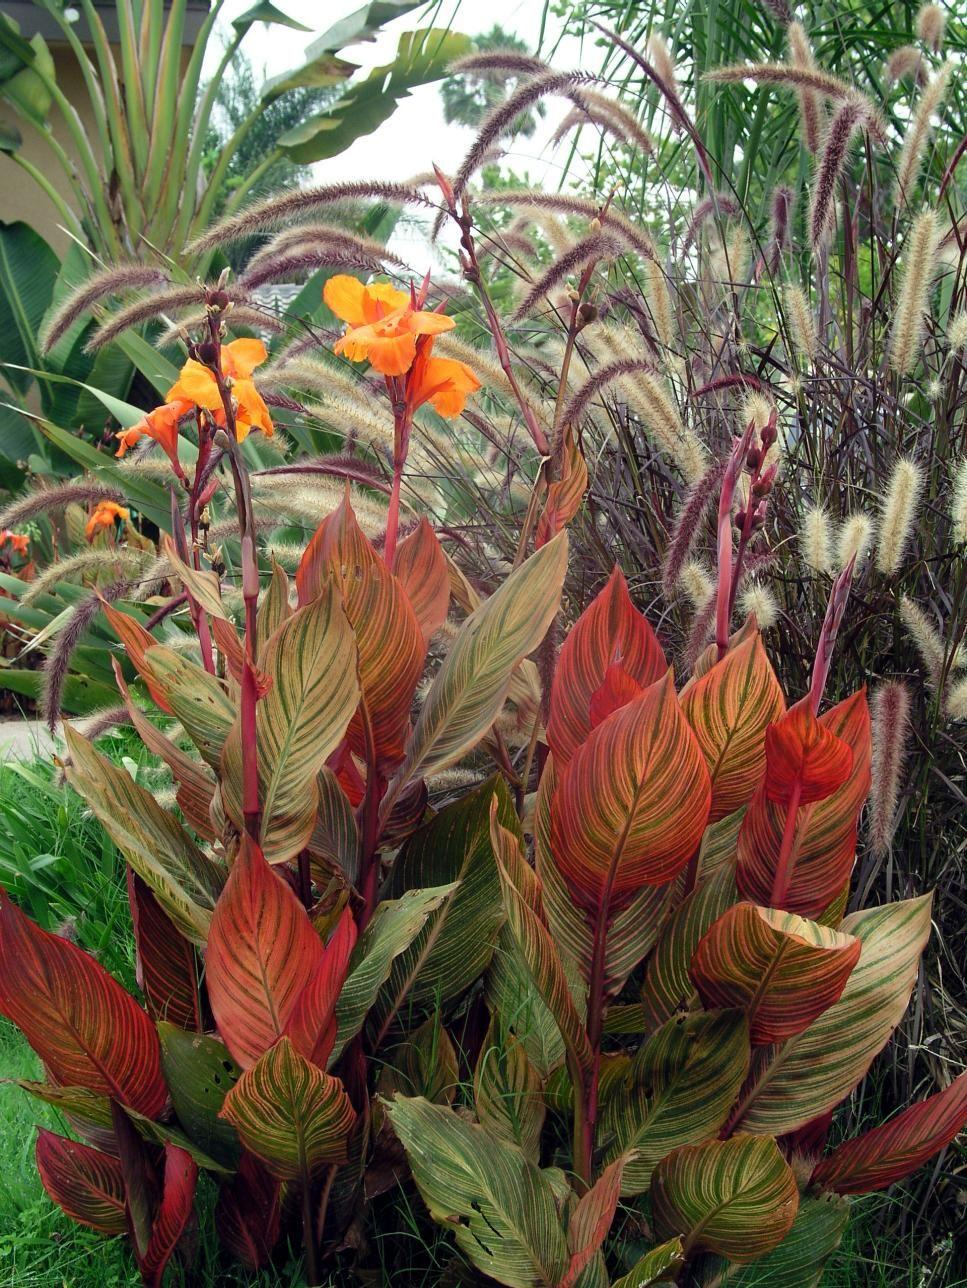 Beautiful Photos of Summer Gardens | Summer garden, Gardens and ...